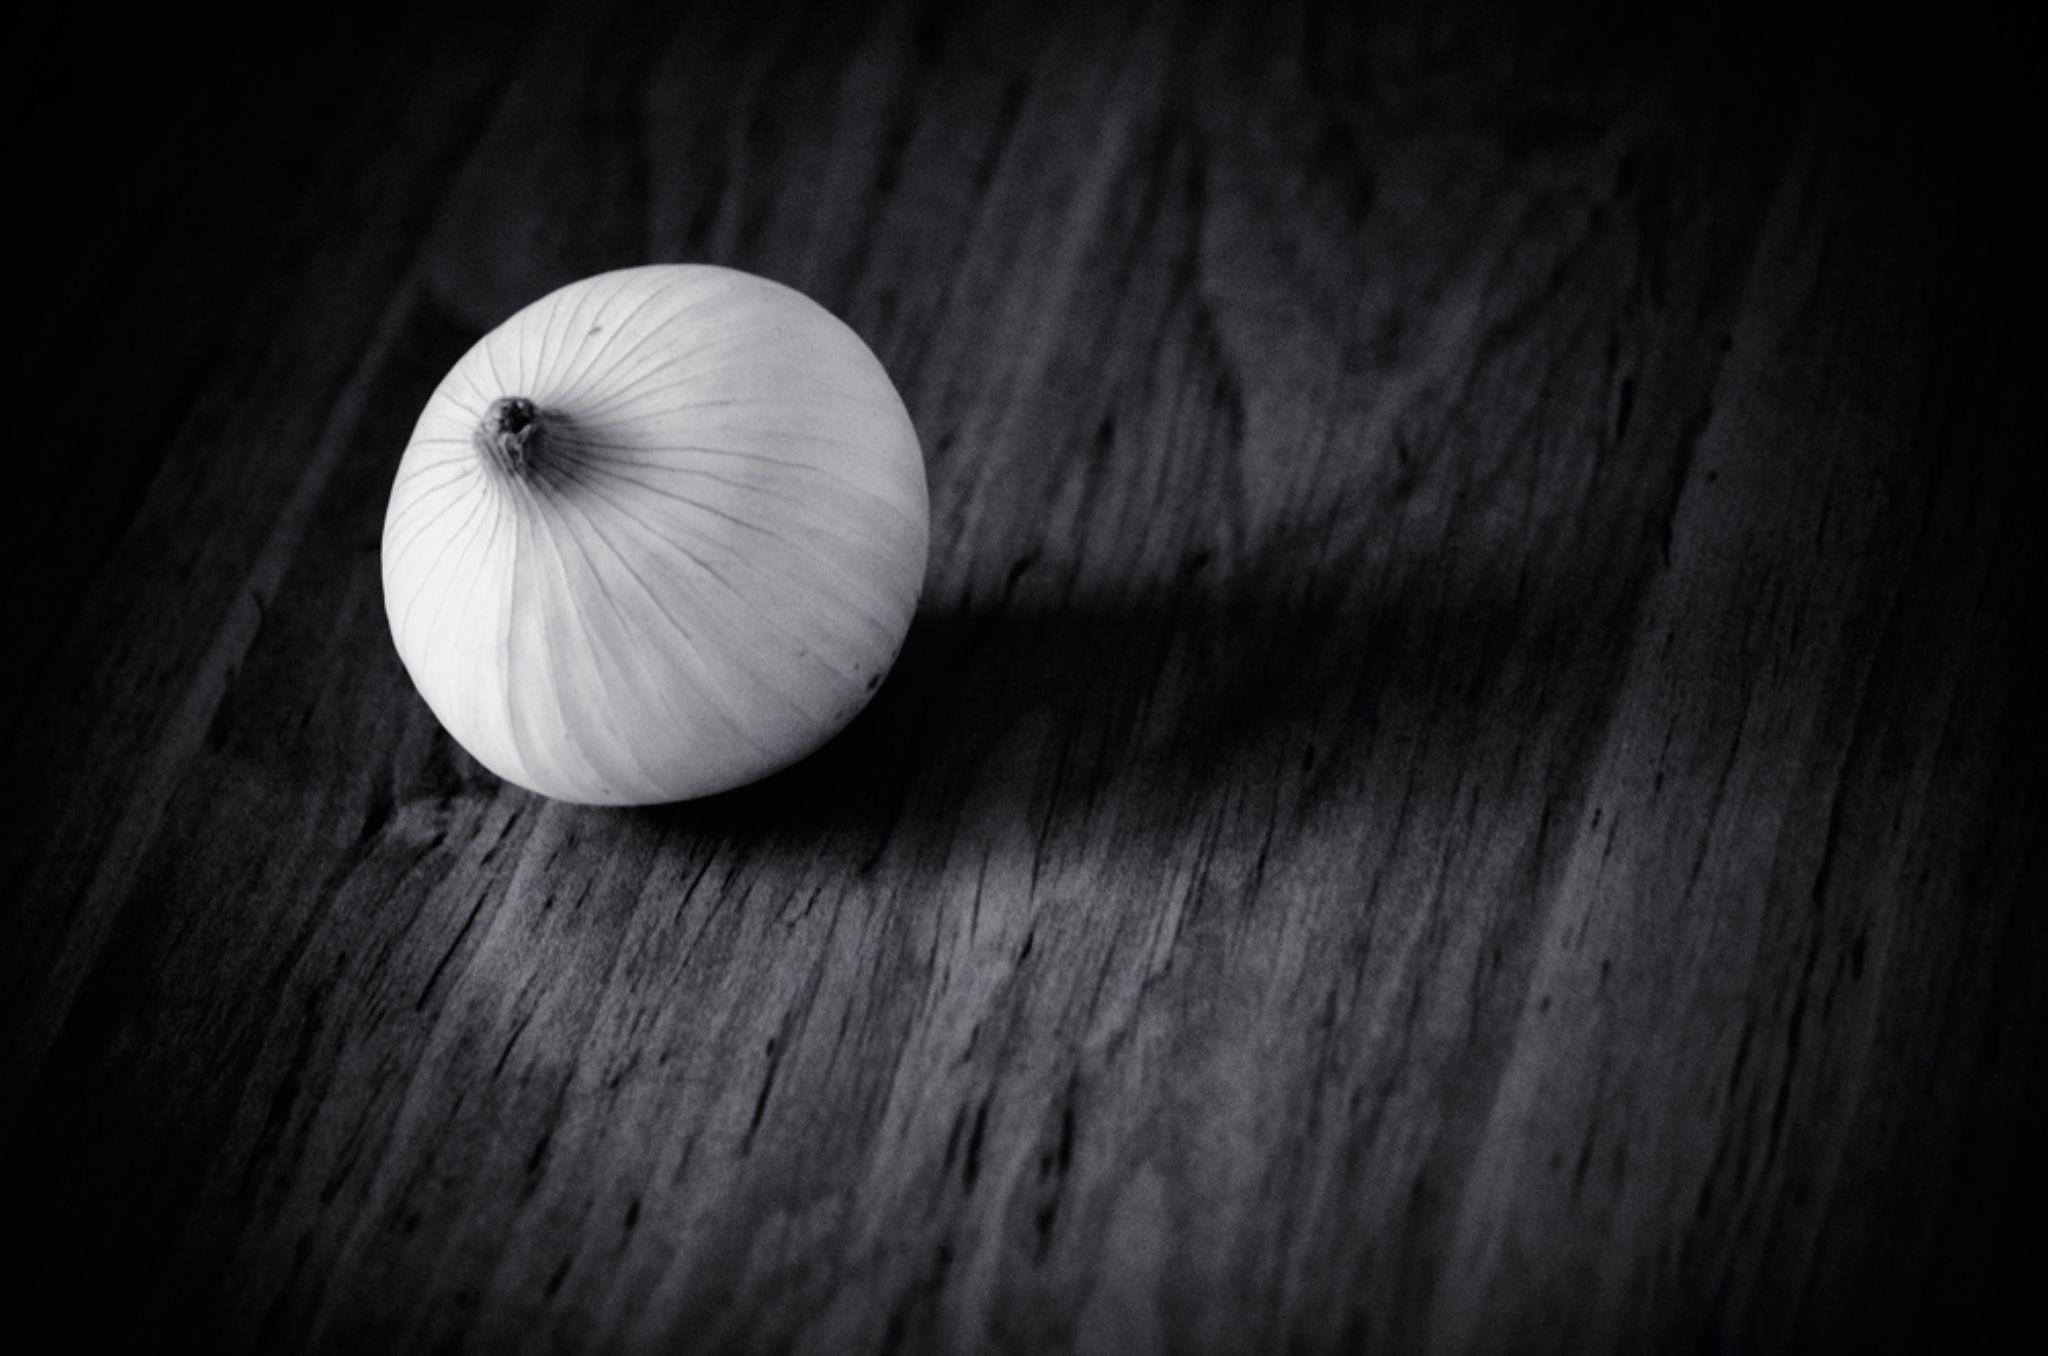 Black And White by mahdi chegeni